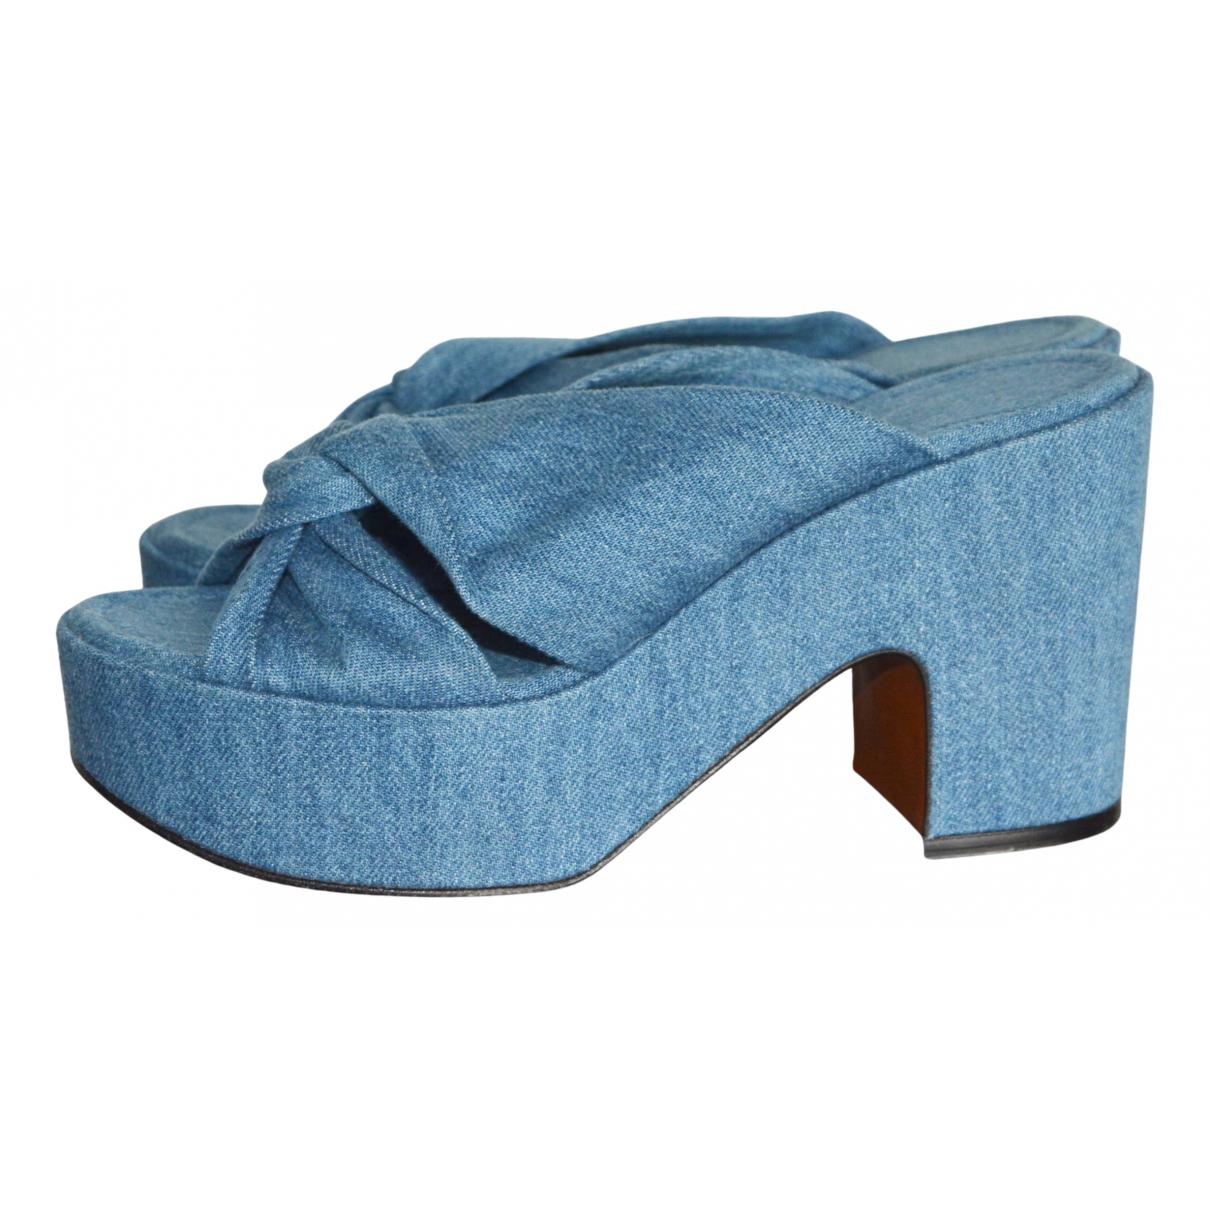 Robert Clergerie N Blue Cloth Mules & Clogs for Women 40 EU